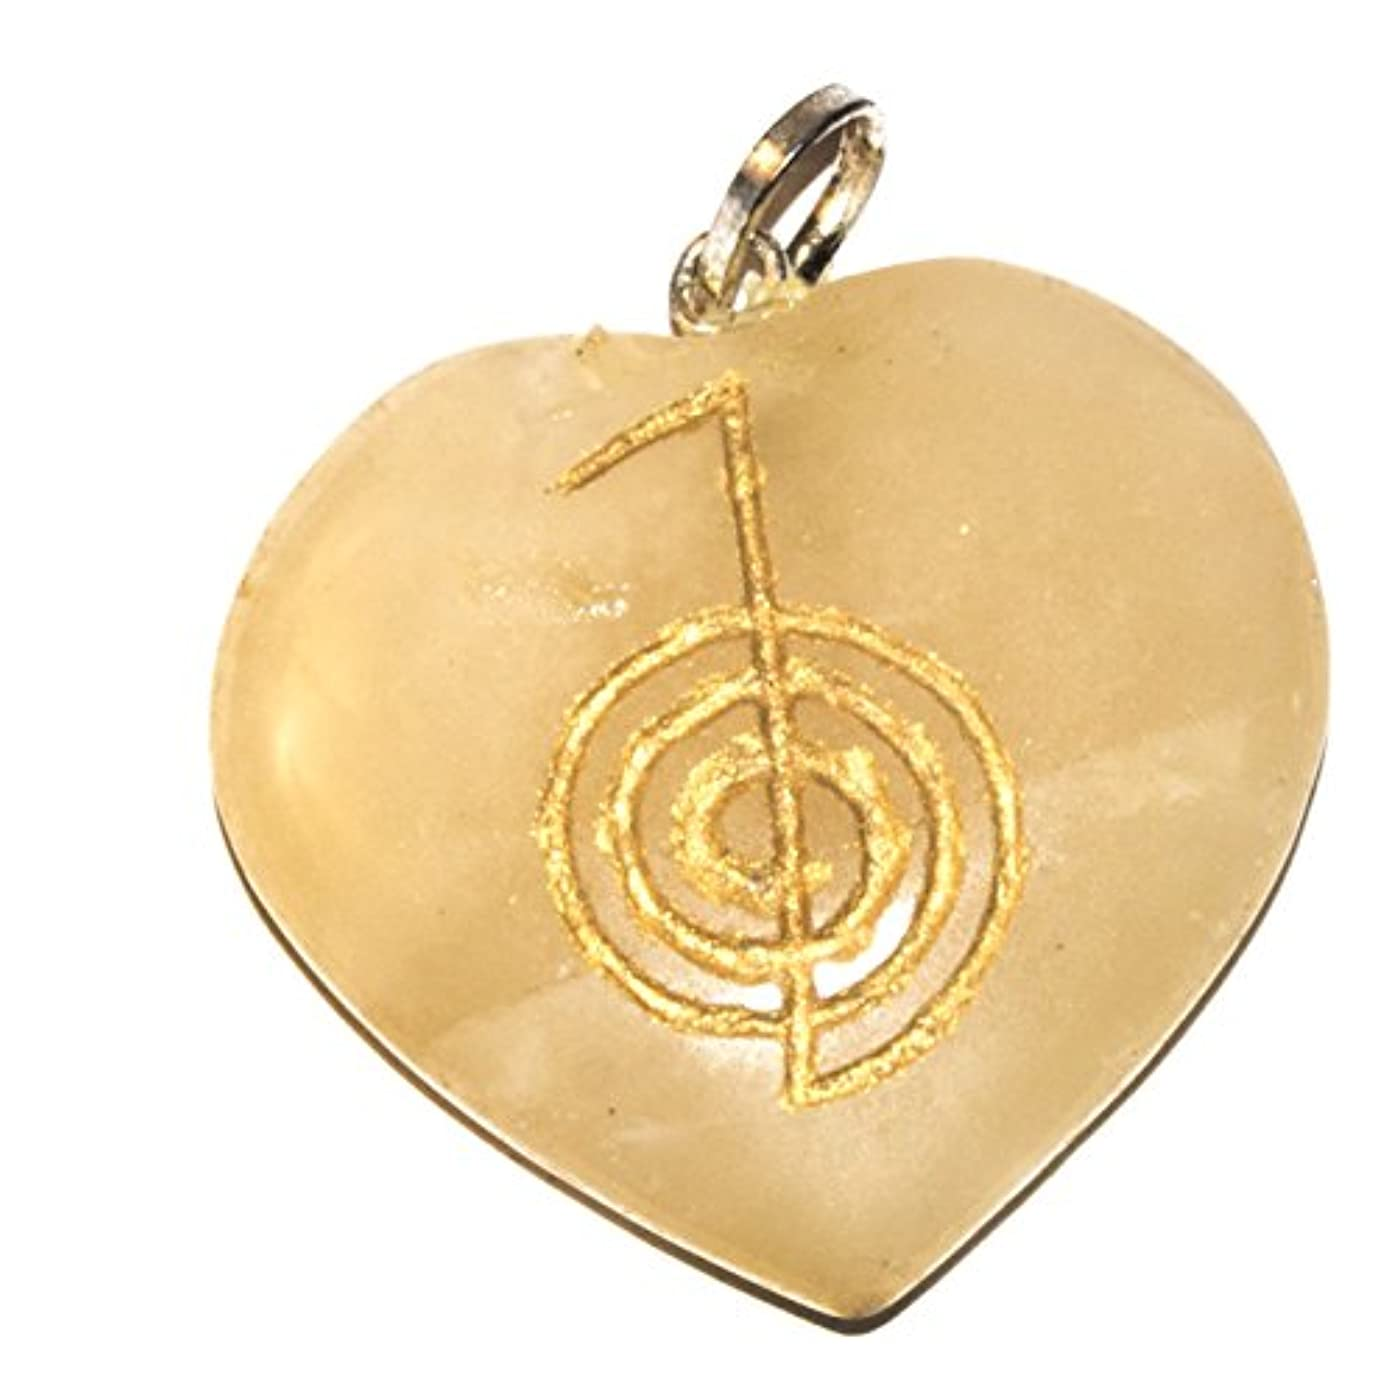 Crocon Yellow Gold Aventurine Heart Shape Pendant with Engraved cho ku rei Power Symbol for Crystal Healing Reiki Love Prosperity Success Abundance Protective Stone